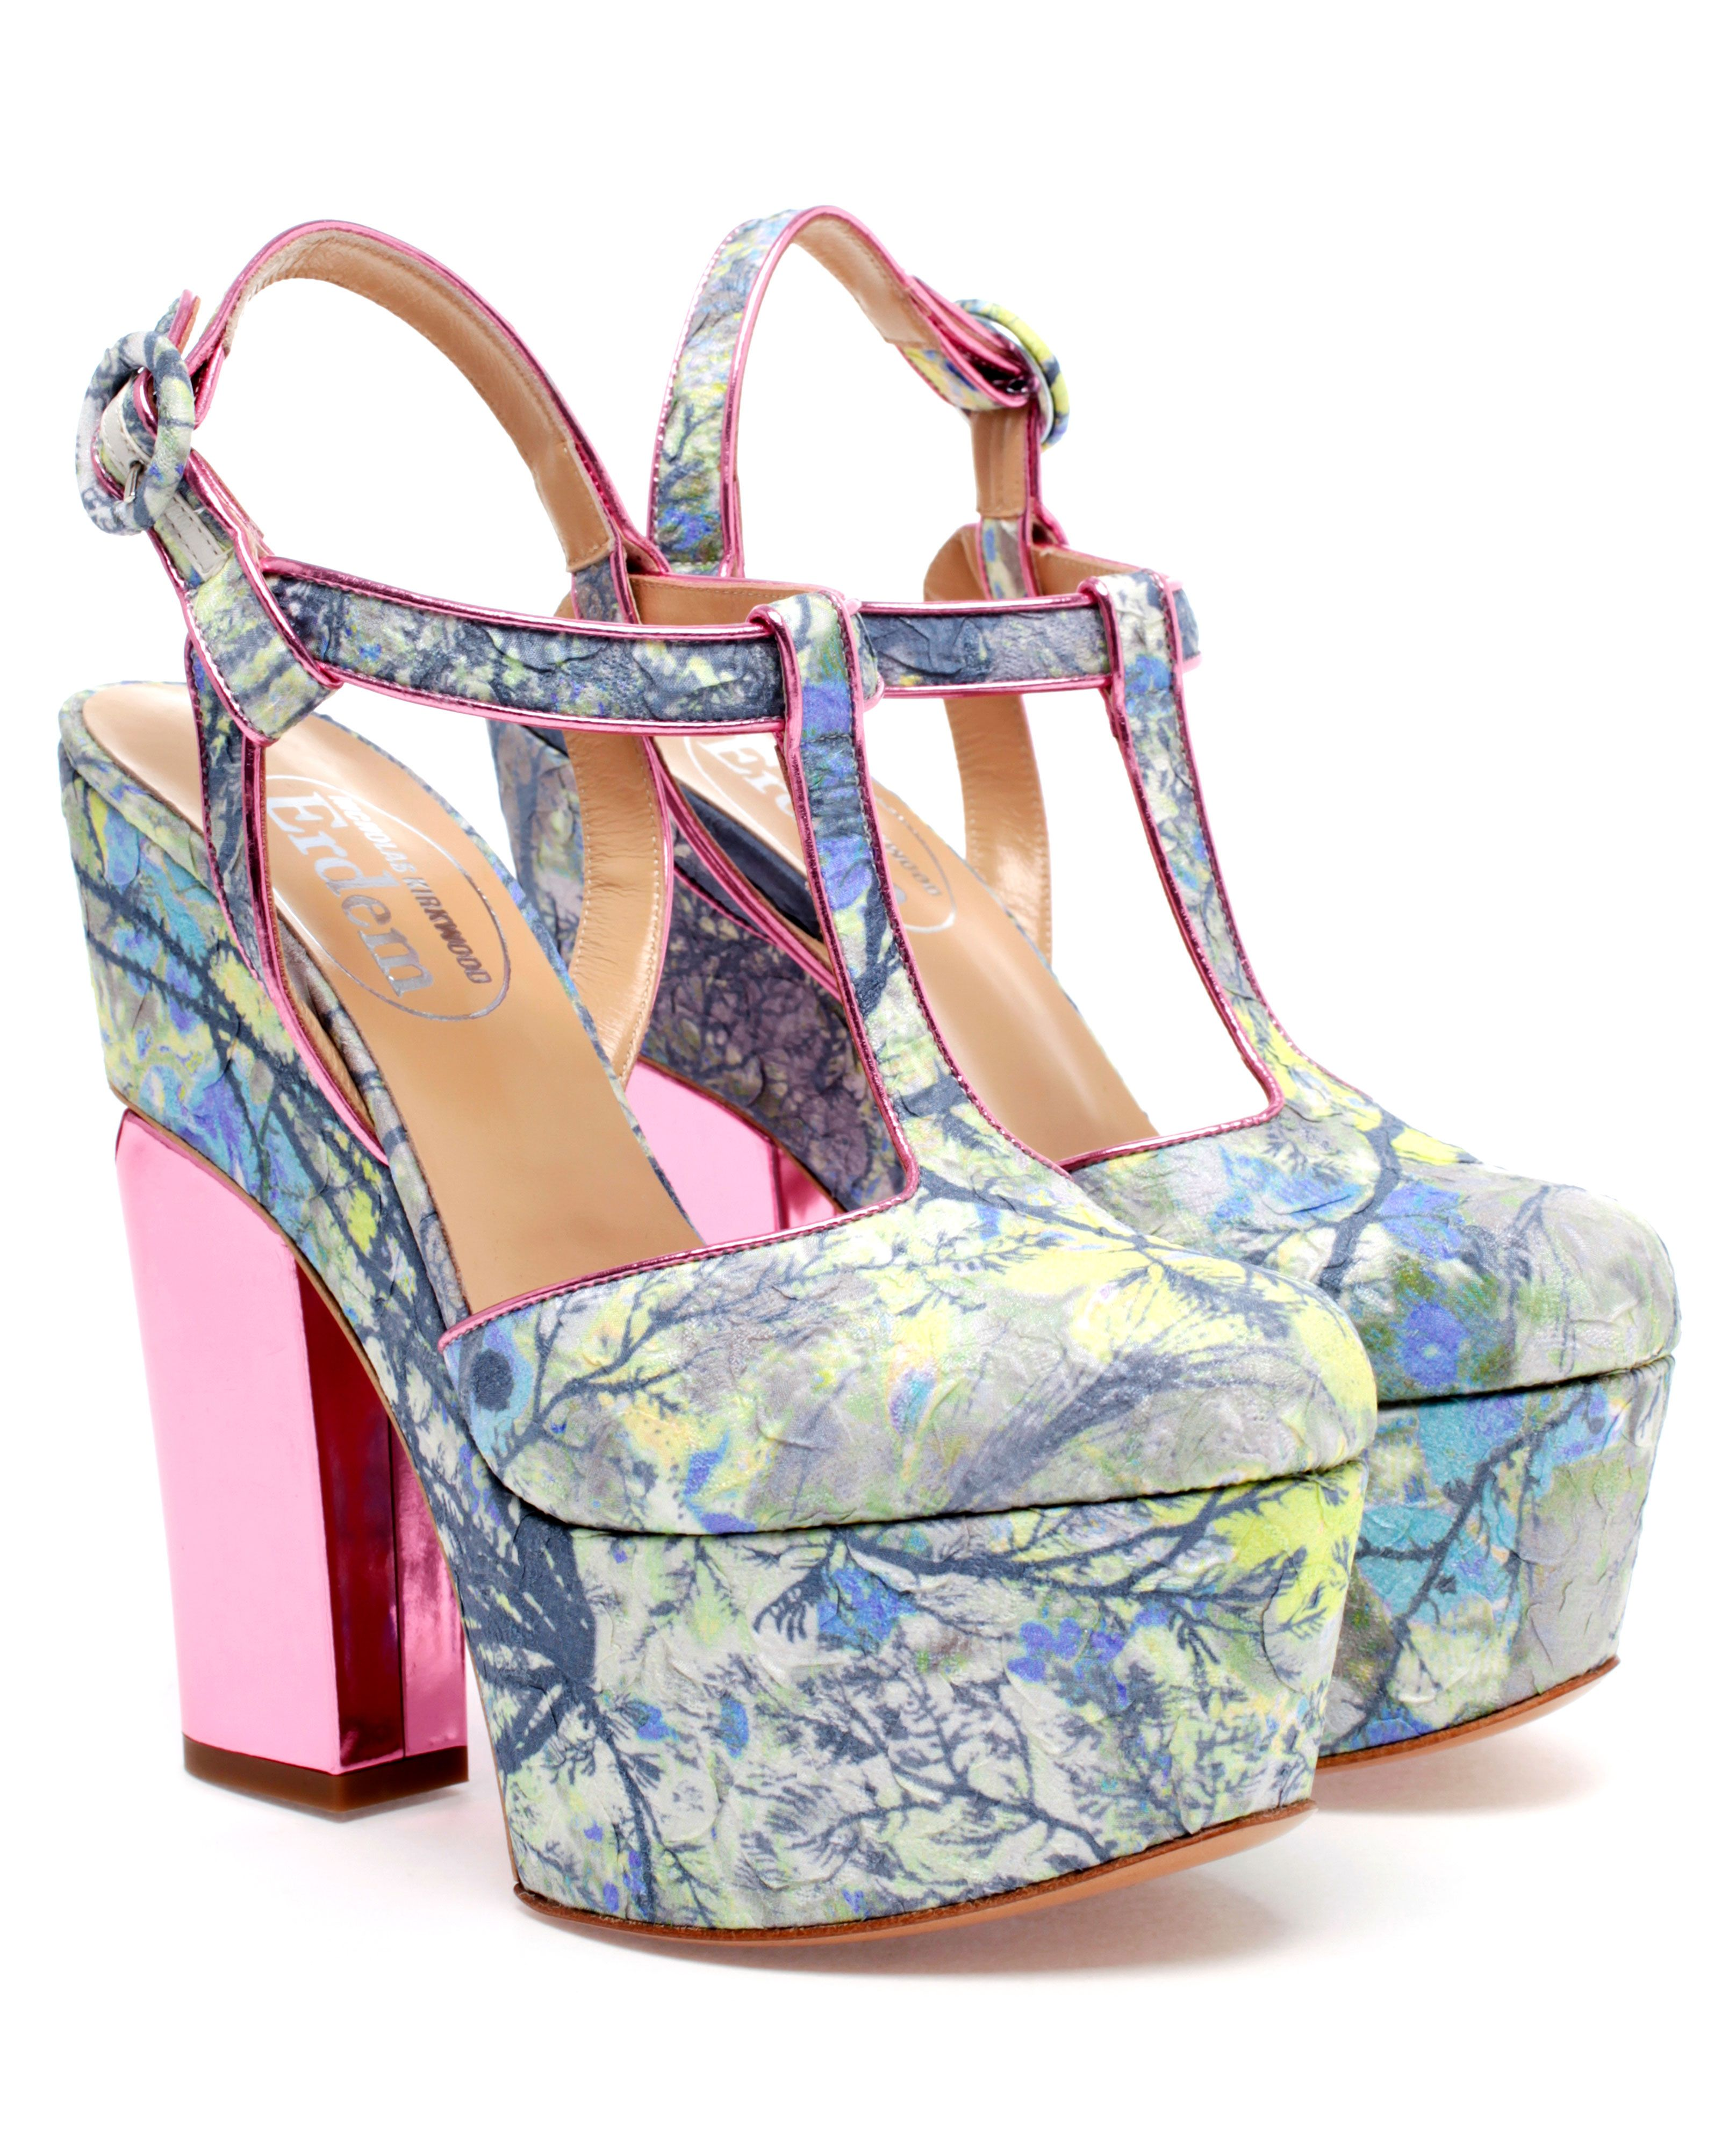 NICHOLAS KIRKWOOD | Floral Brocade Platform Pumps | Browns fashion & designer clothes & clothing